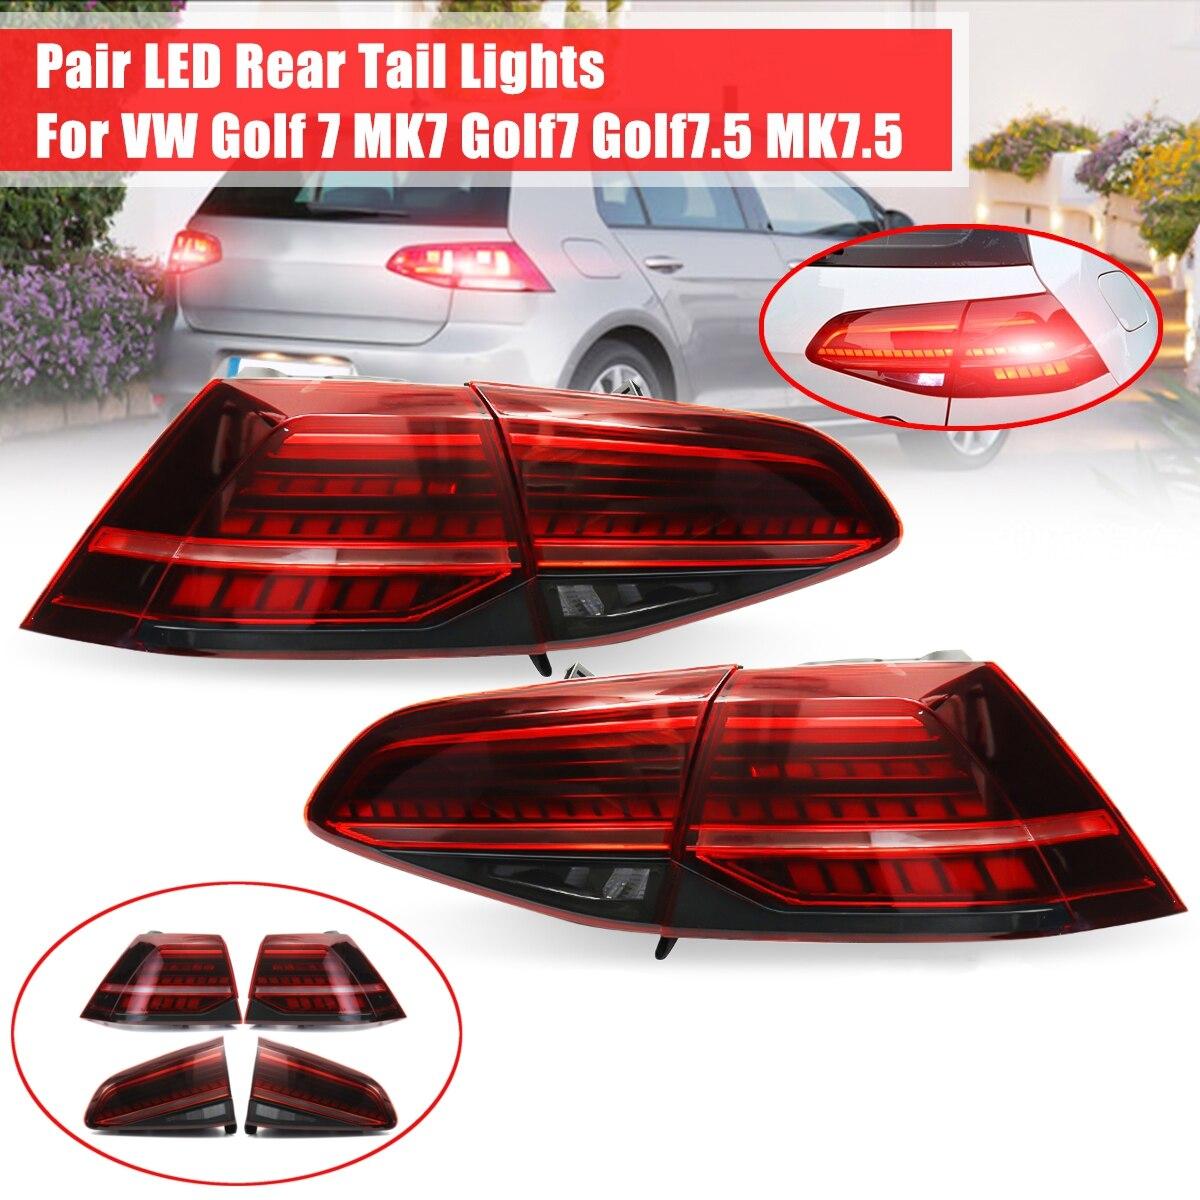 for VW Golf 7 MK7 Golf 7 Golf 7 5 MK 7 5 LED Tail Light Brake Light Taillights Tail Lights LED Rear Lamp taillight Automobile